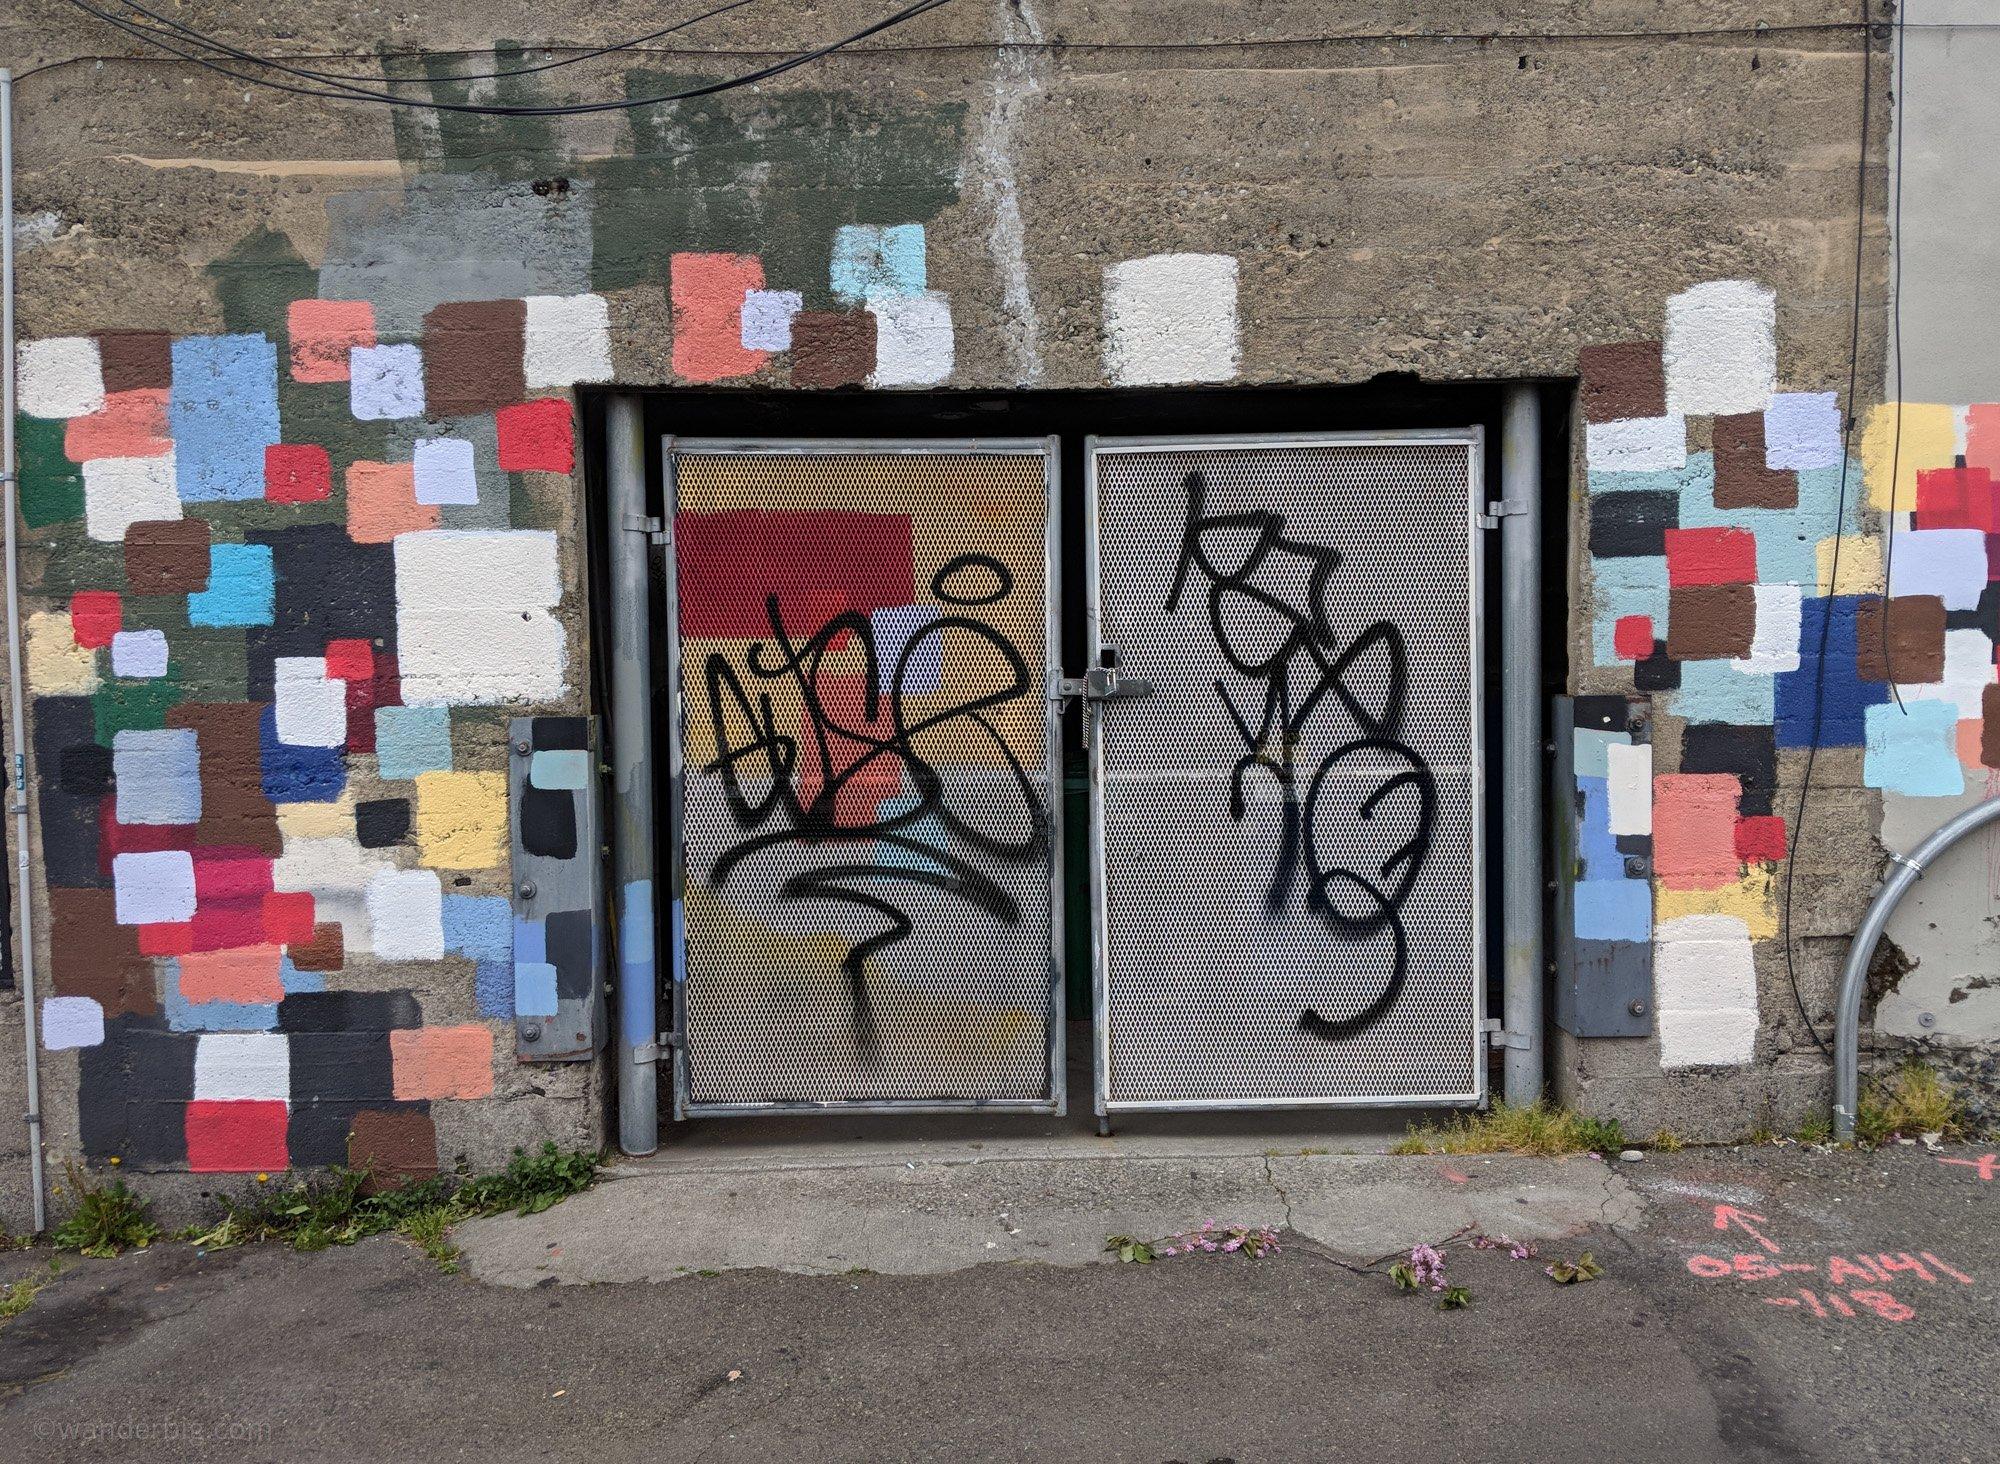 Wb seattle murals 06 1